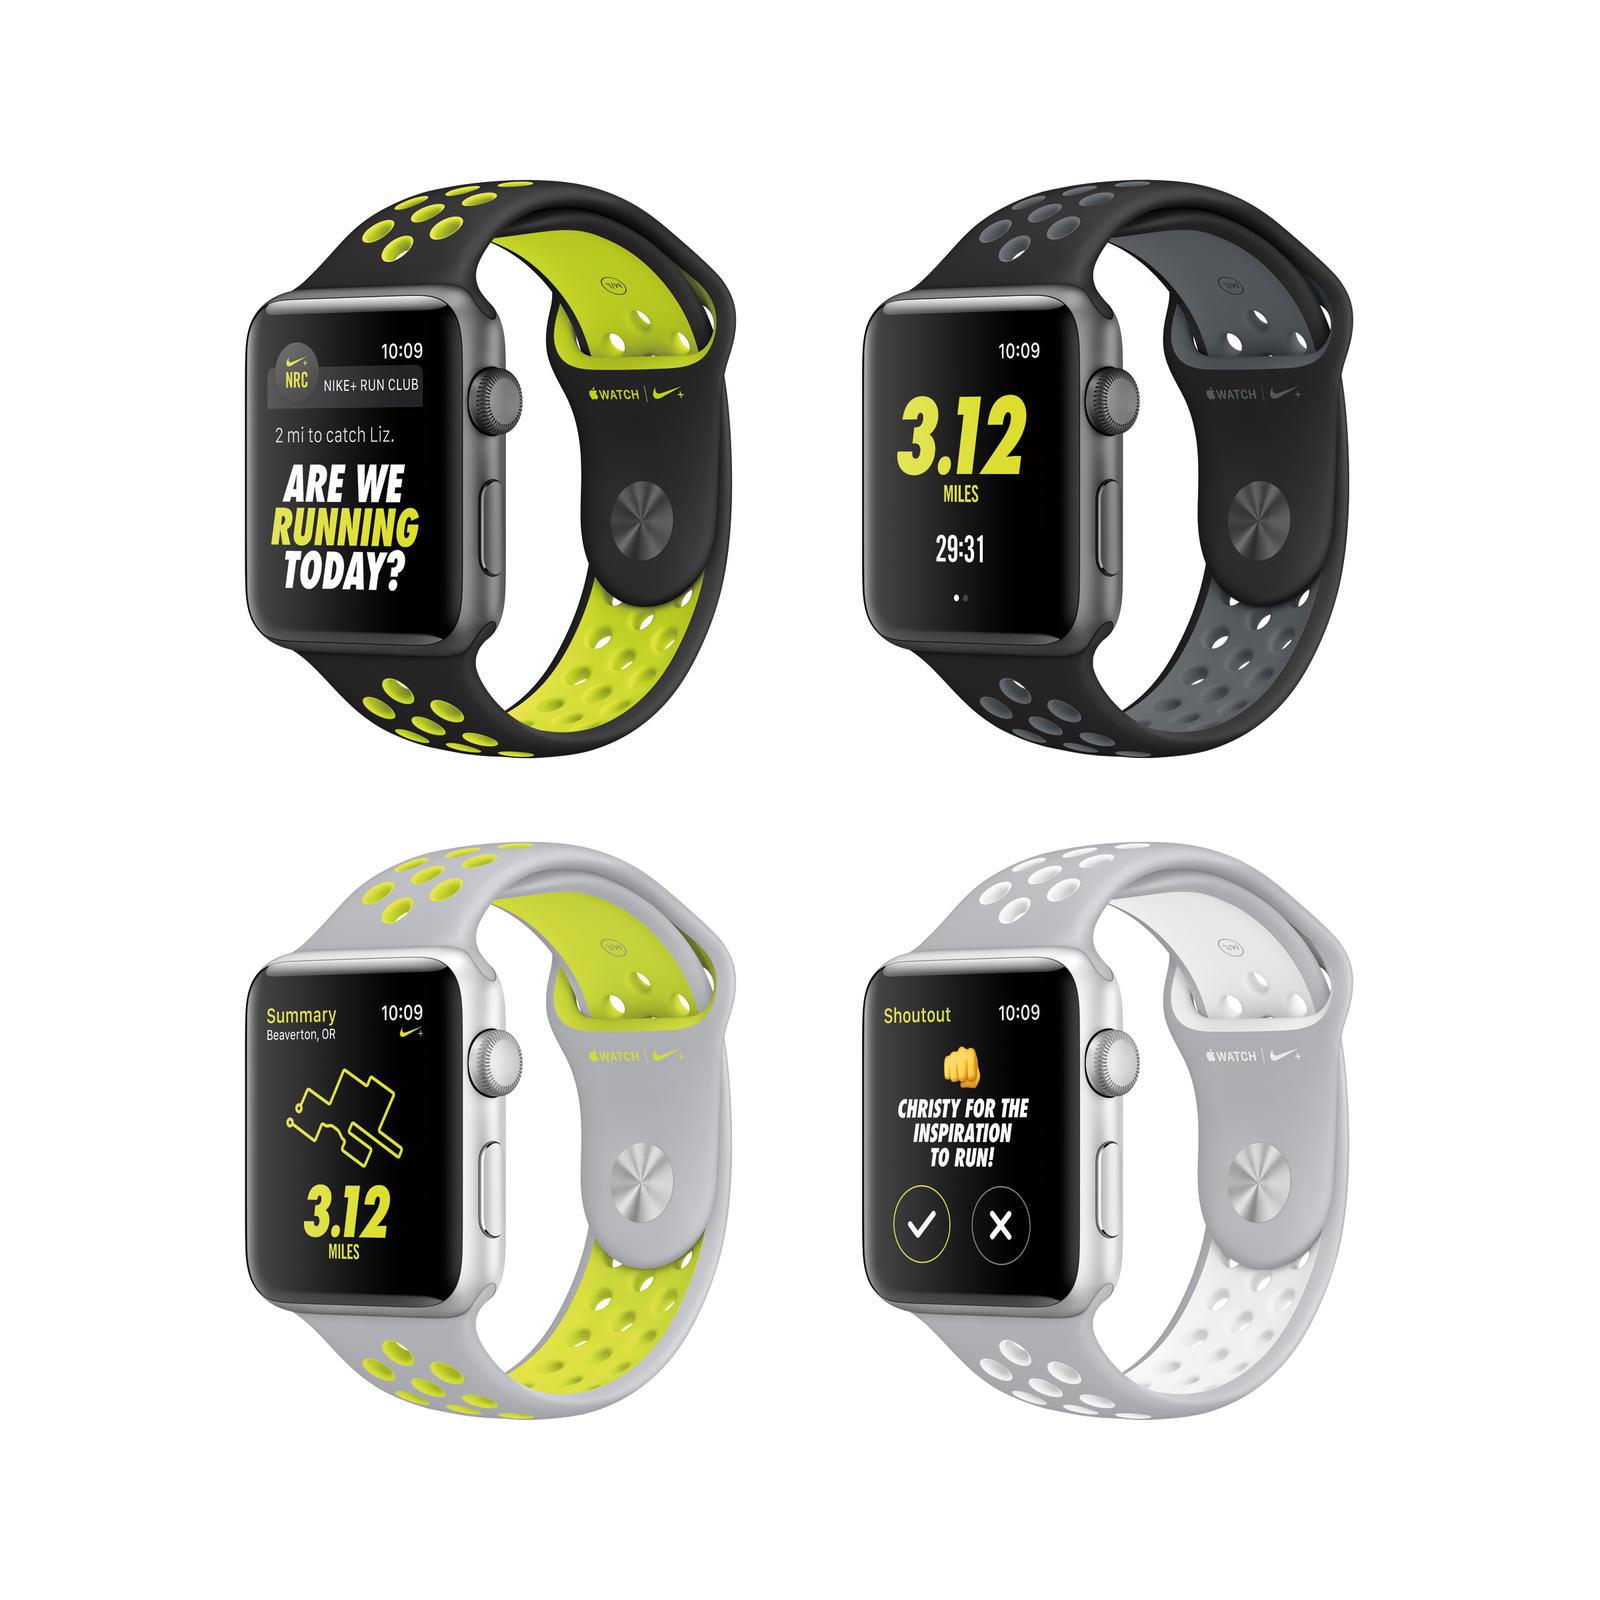 Nike-Plus-Apple-Watch-2016-Data_native_1600.jpg